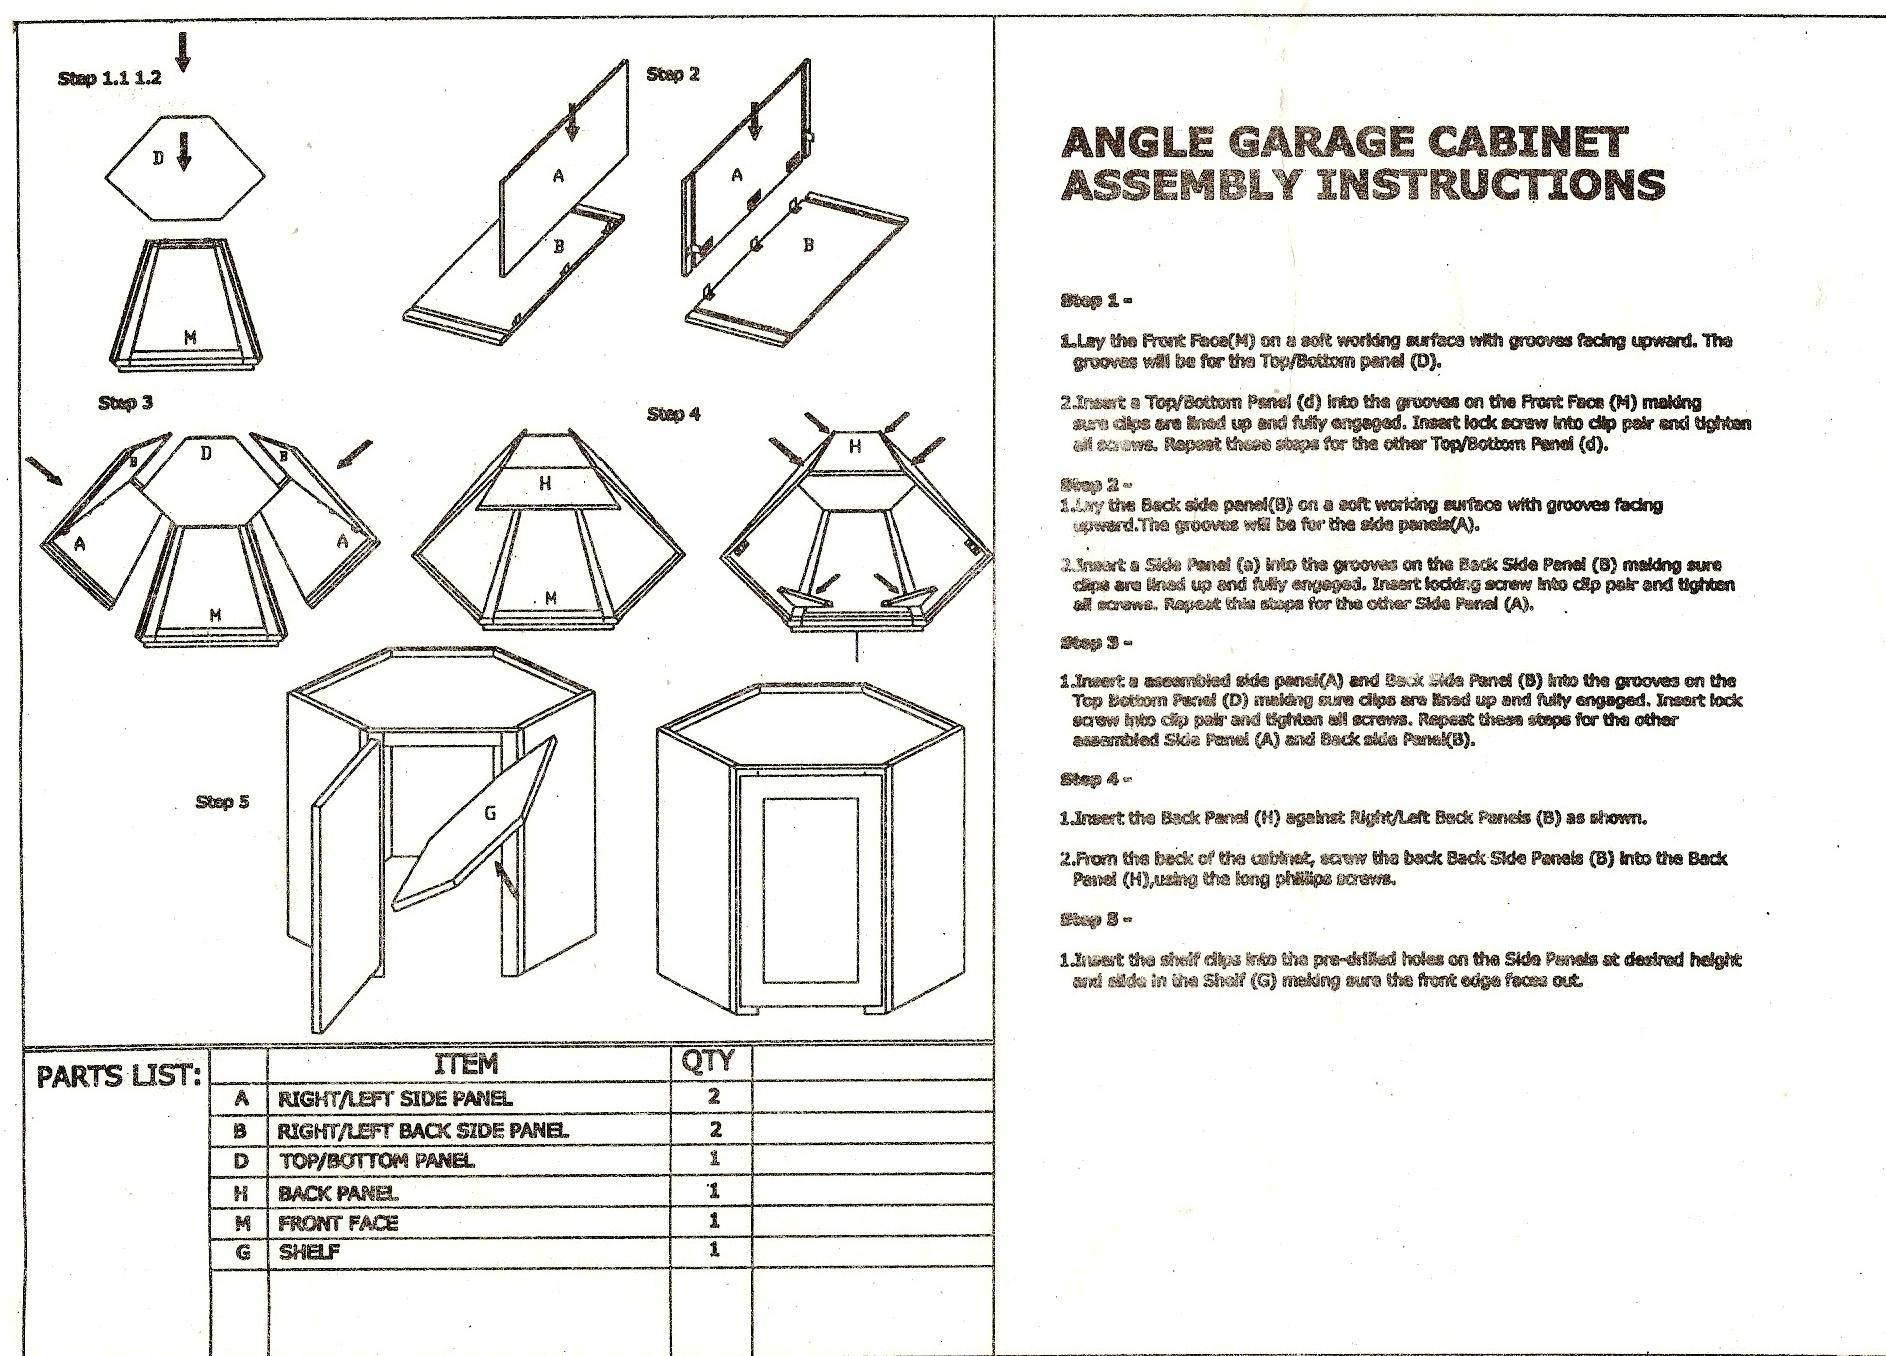 RTA Appliance Garage Assembly instruction